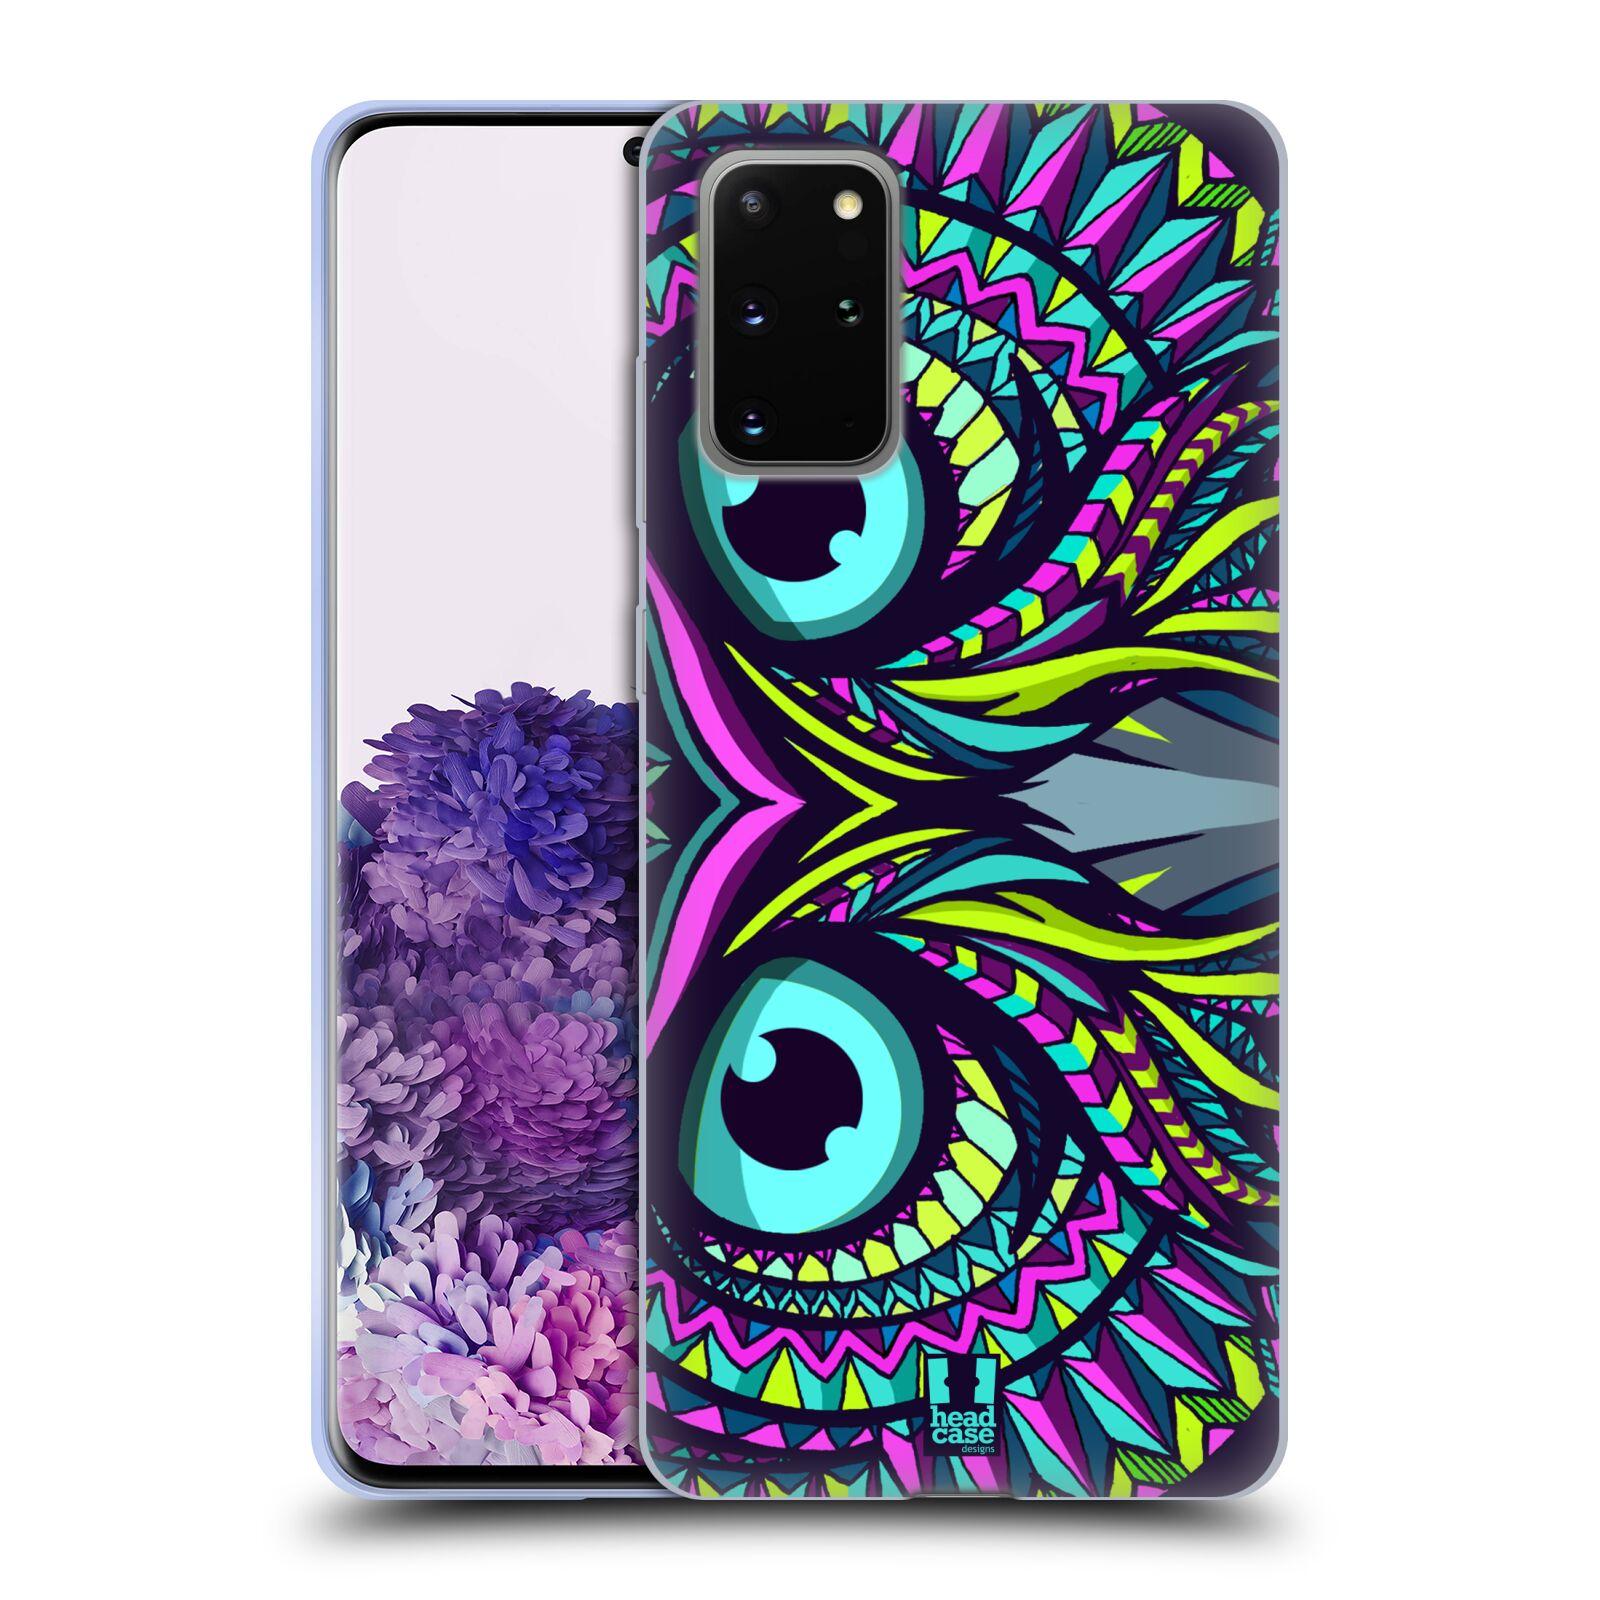 Silikonové pouzdro na mobil Samsung Galaxy S20 Plus - Head Case - AZTEC SOVA